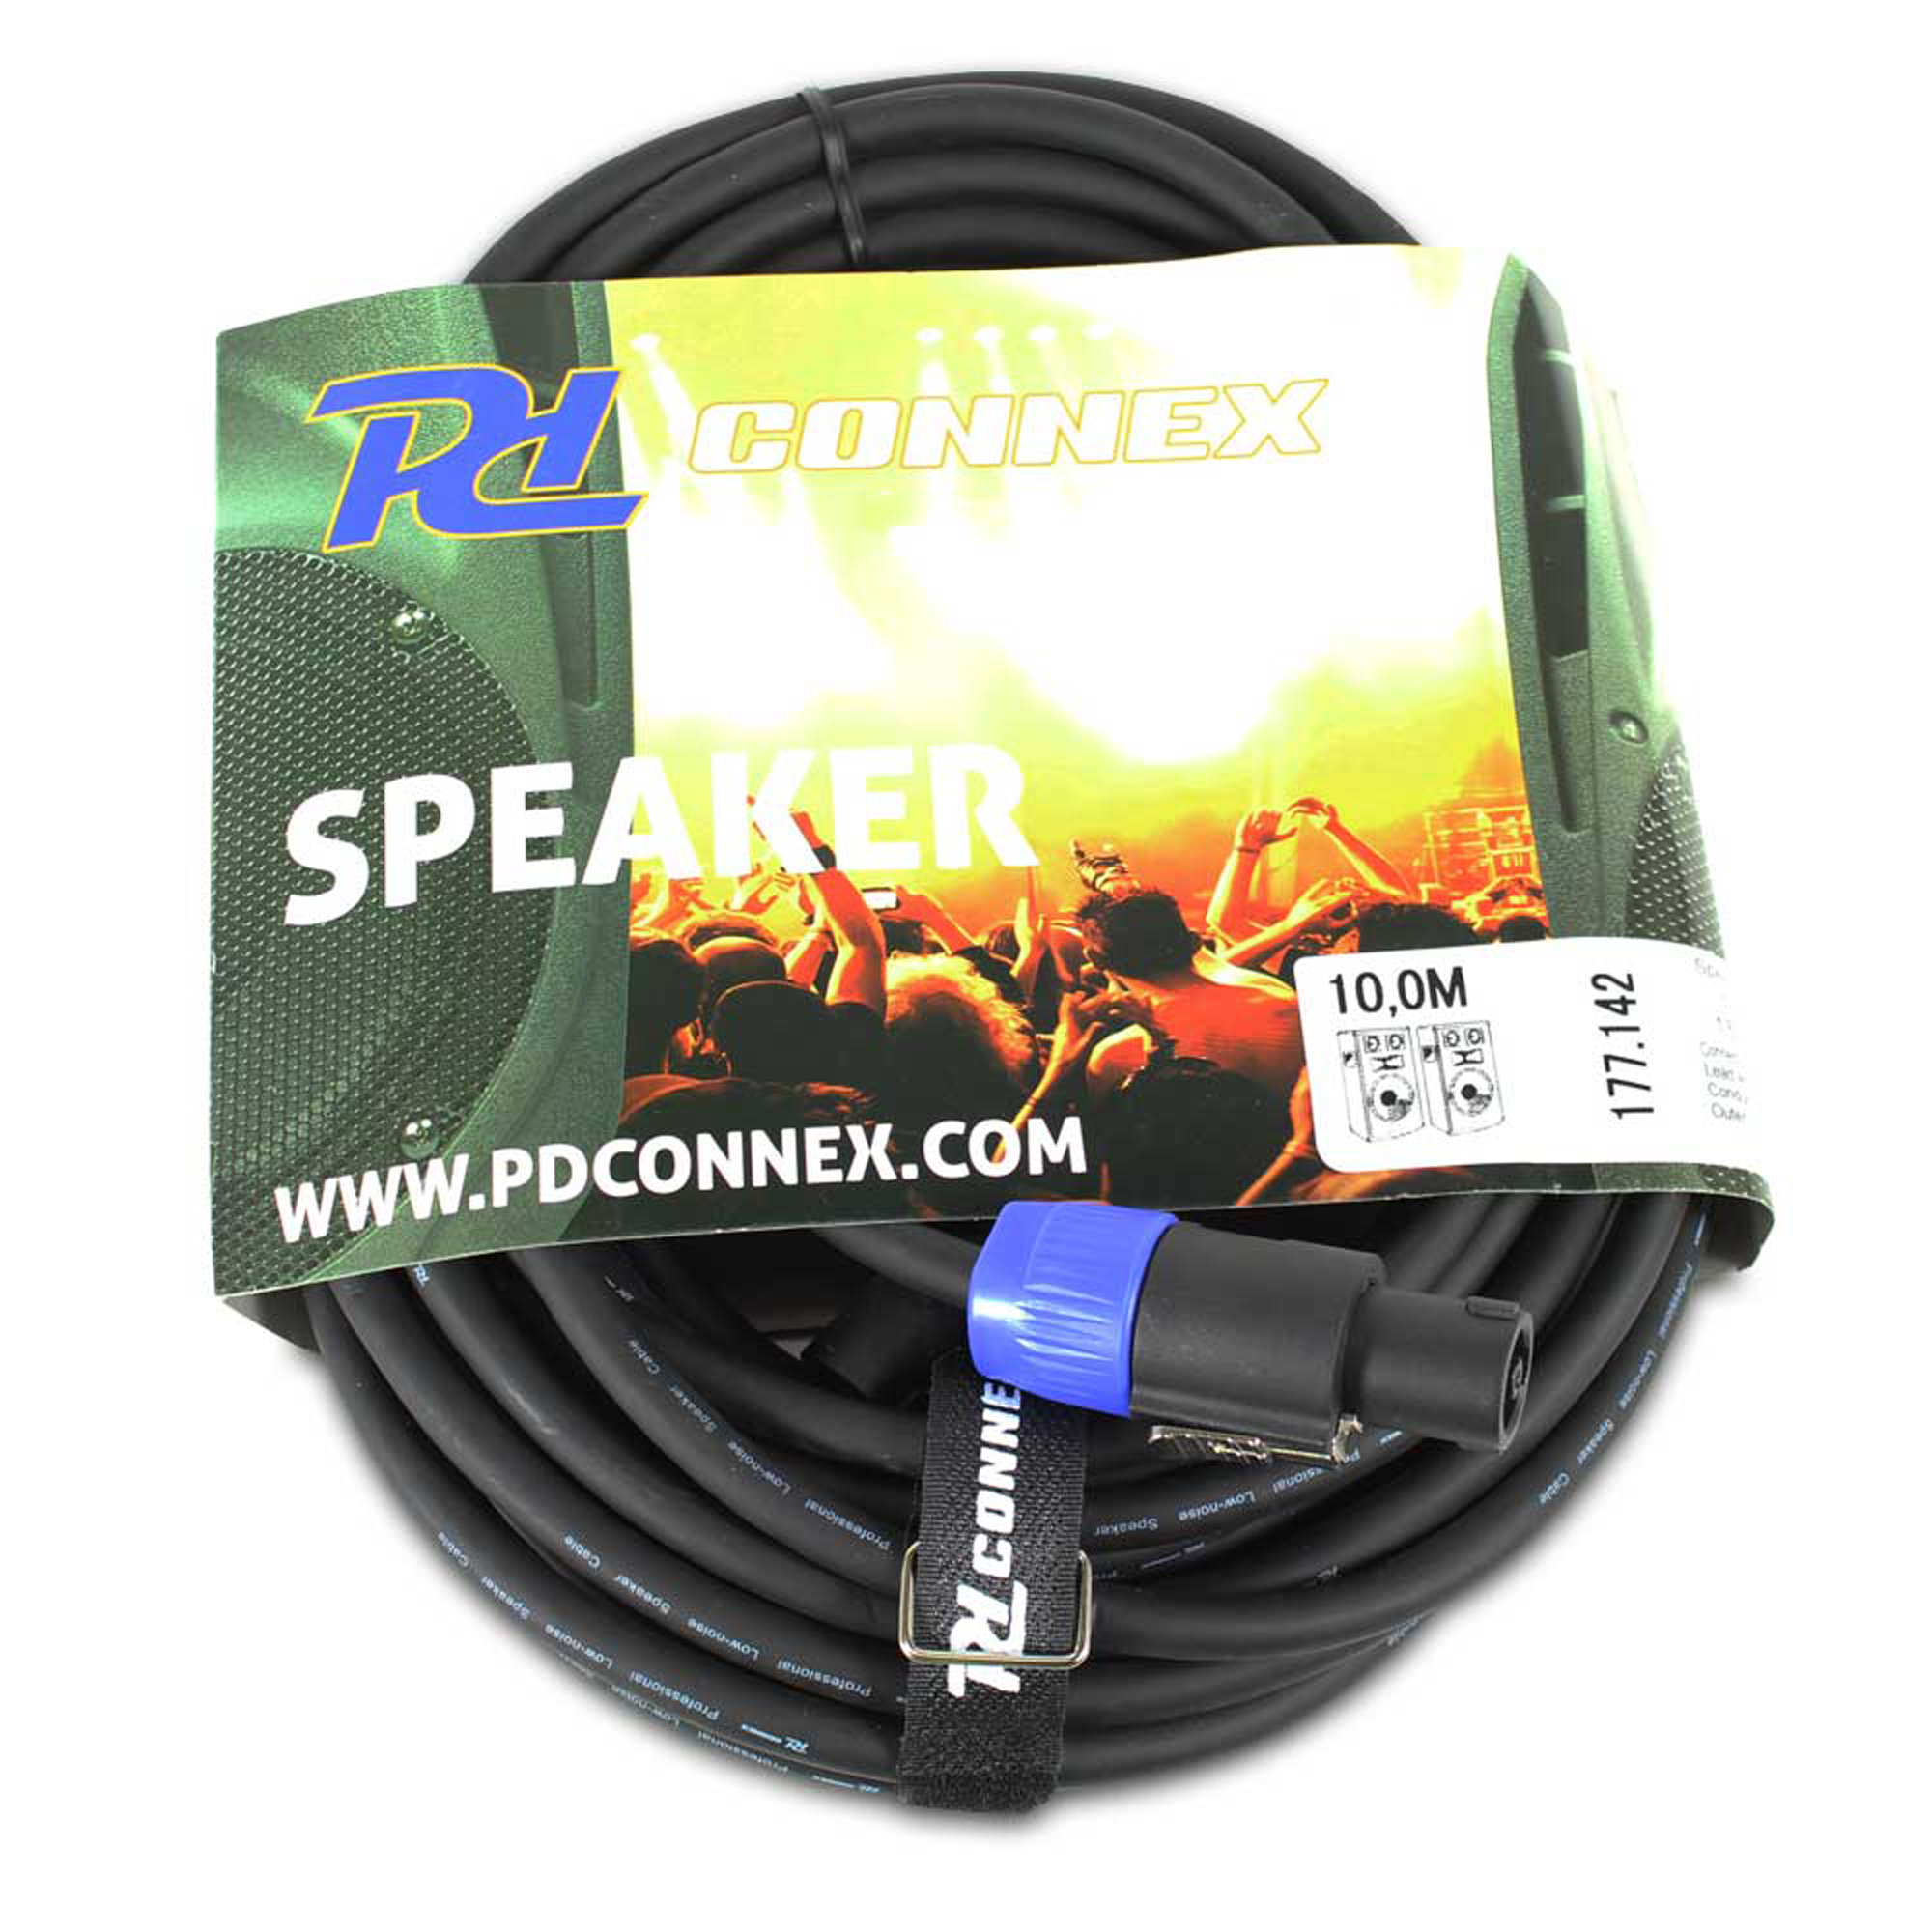 2x 10 meter speaker cables power dynamics professional lead hq l2 ends. Black Bedroom Furniture Sets. Home Design Ideas